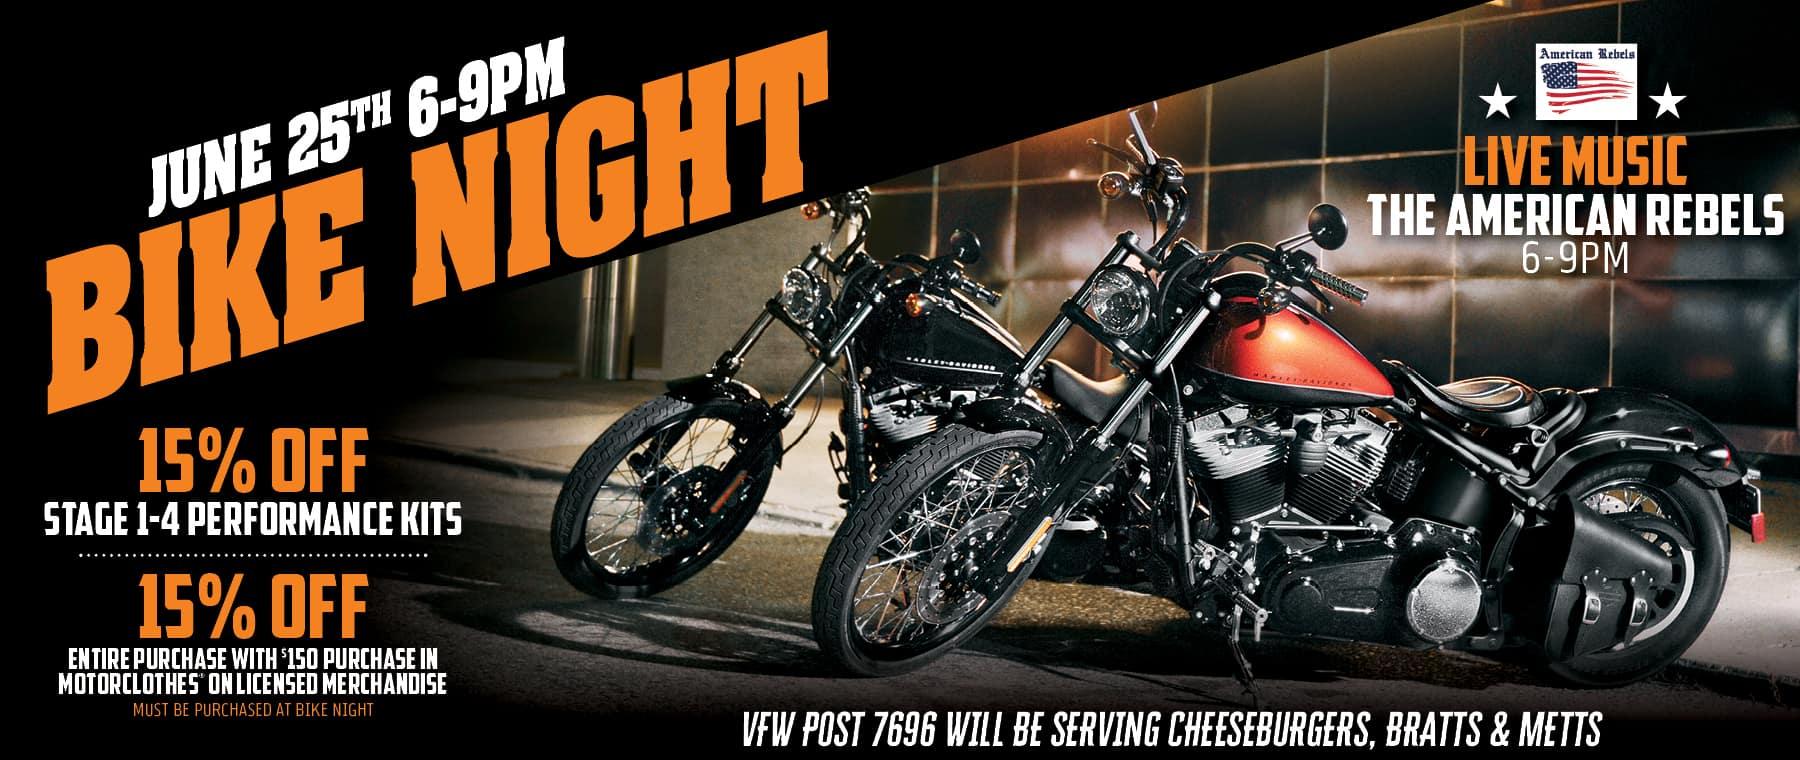 OH01_06_21_Bike_Night_1800x760_WebBnr